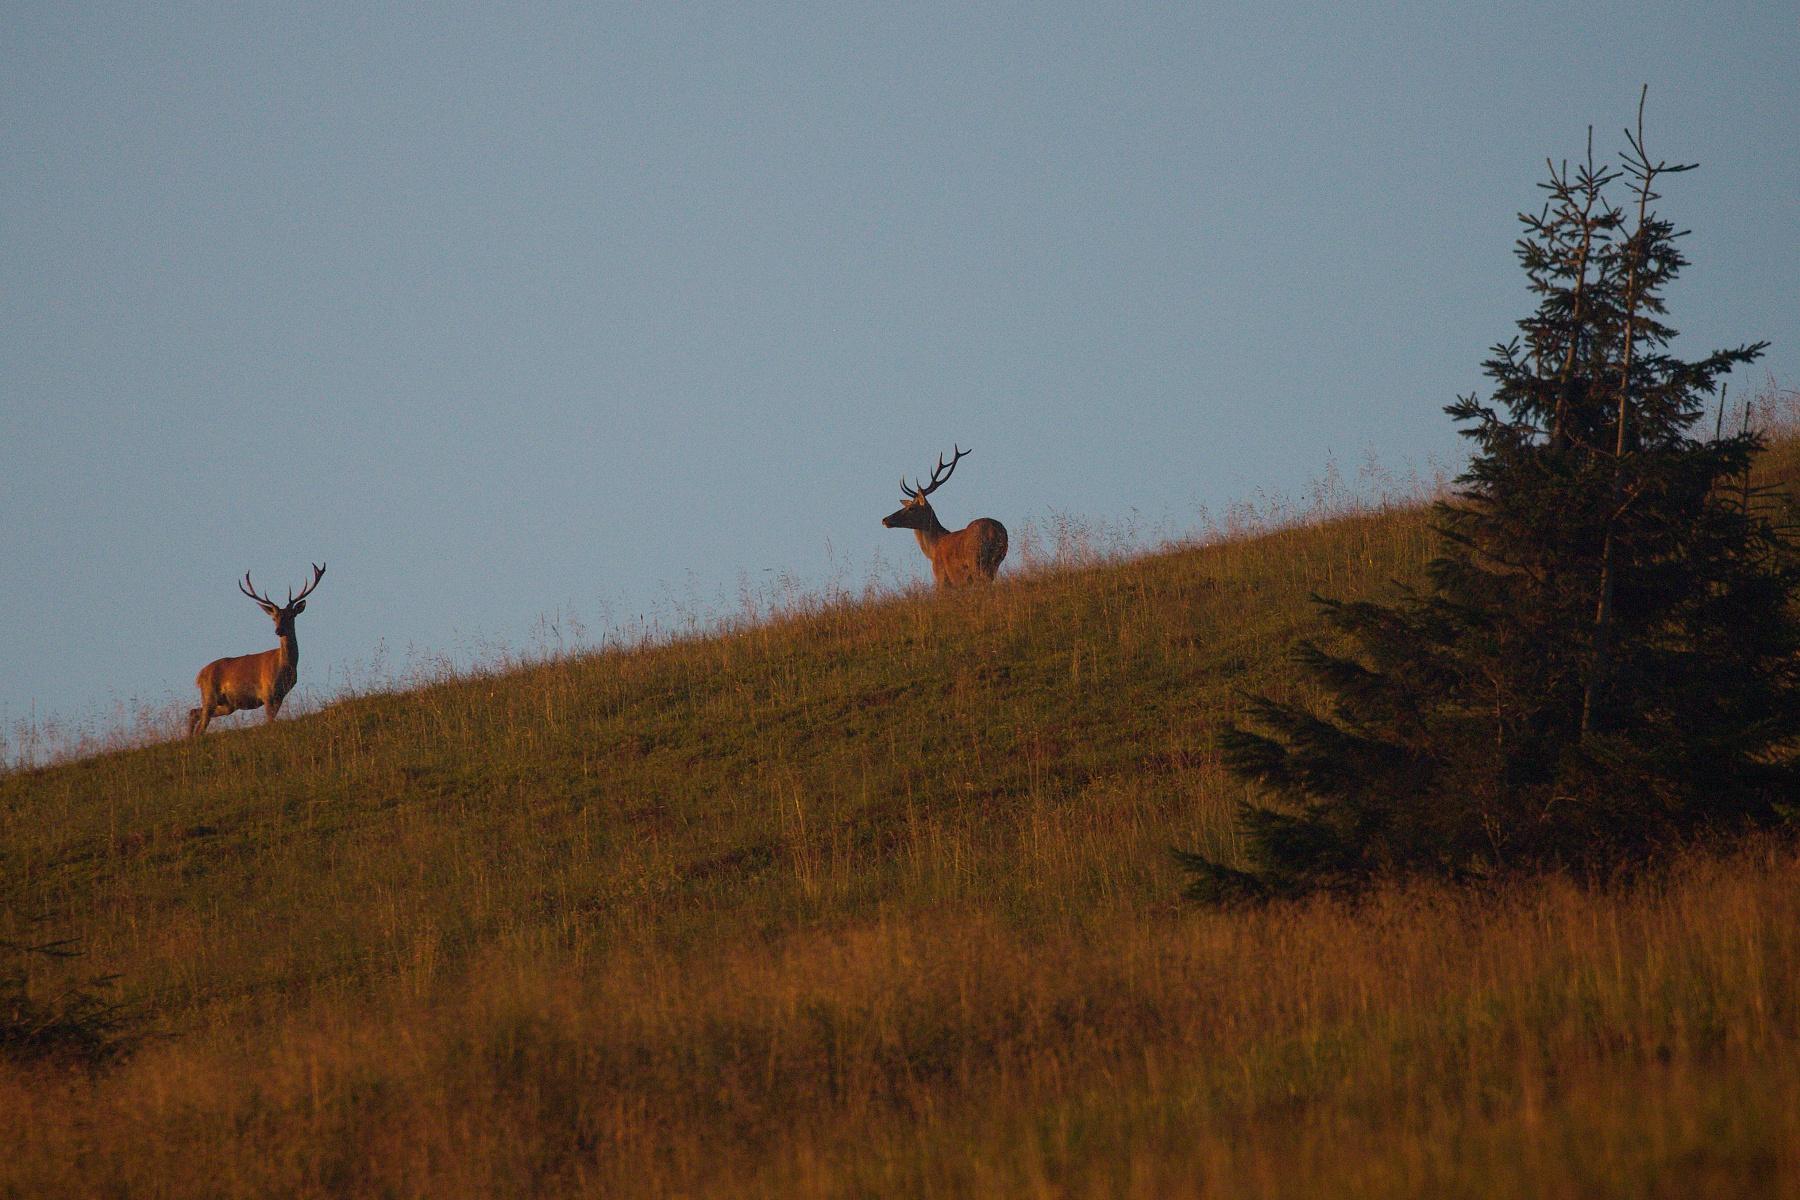 jeleň lesný (Cervus elaphus) Red deer, Veľká Fatra, Slovensko (7)